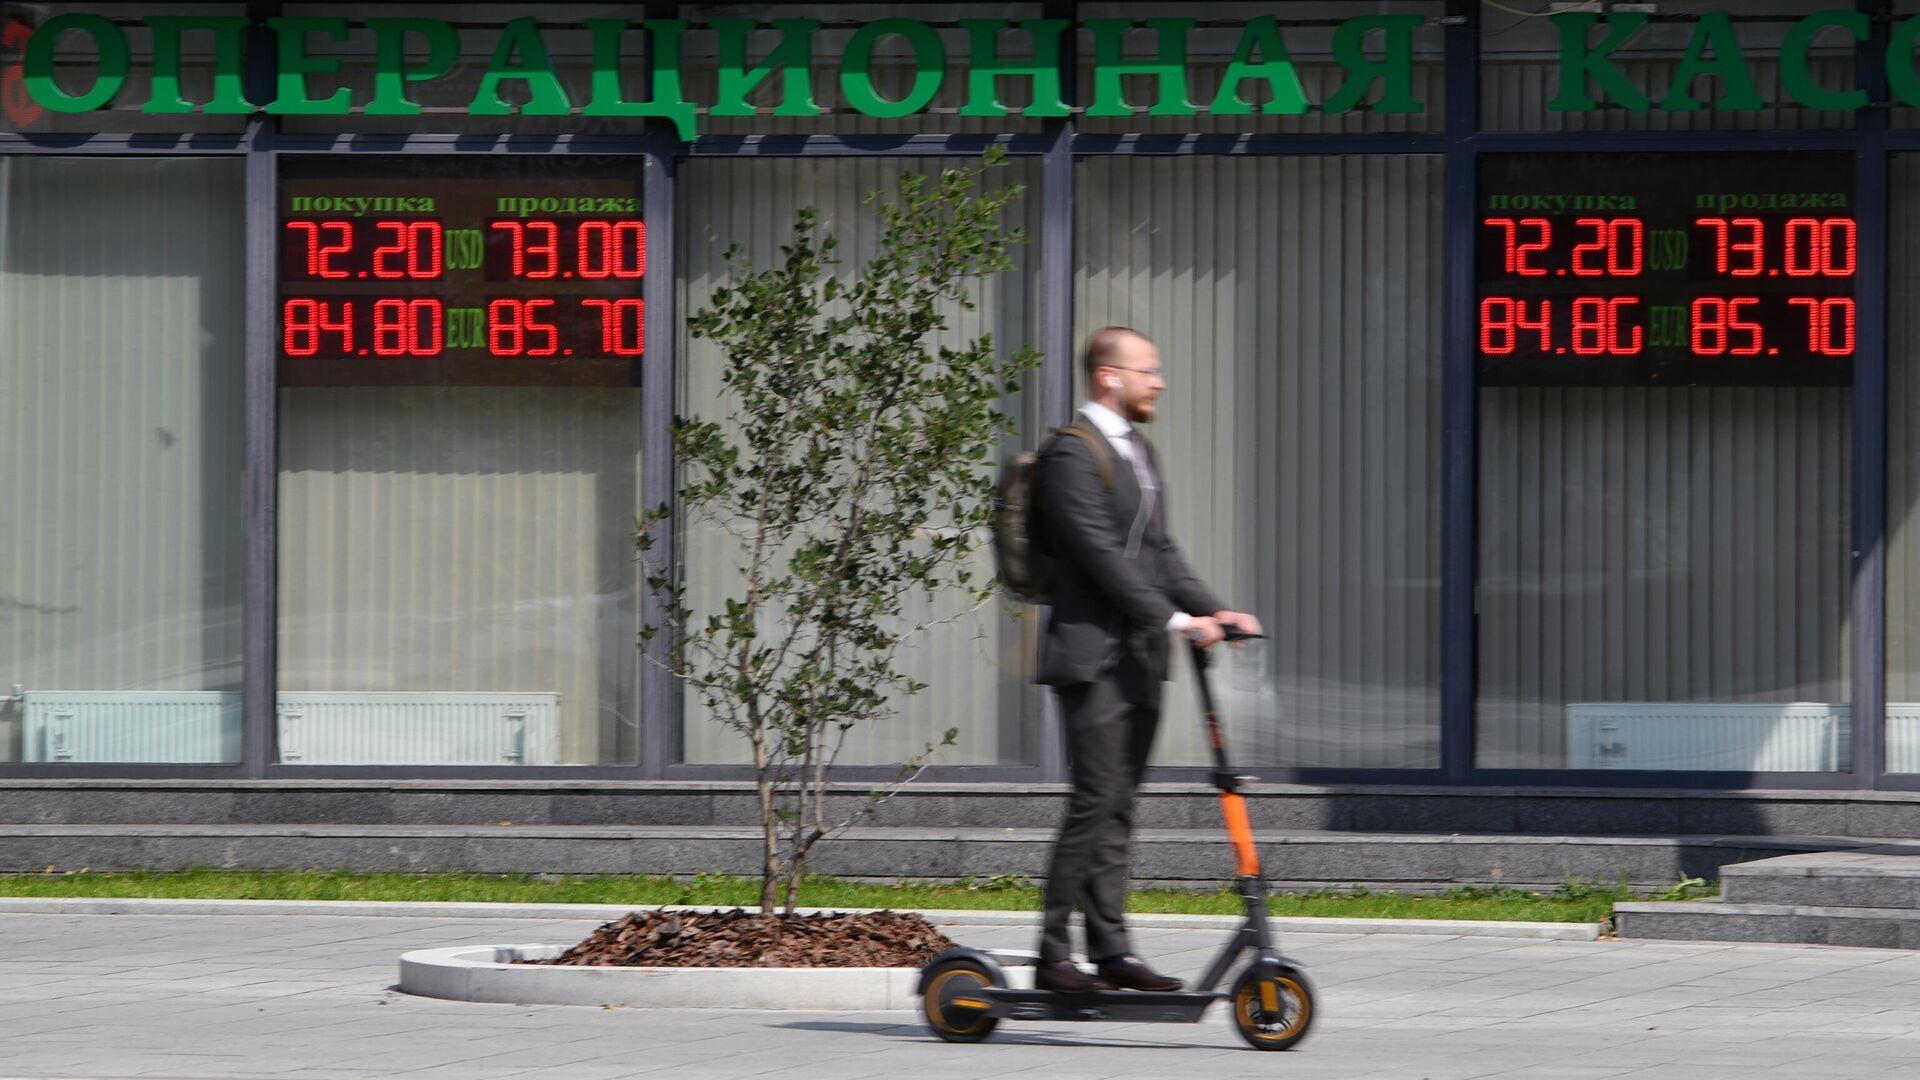 Мужчина около электронного табло с курсами валют в Москве - РИА Новости, 1920, 18.11.2020